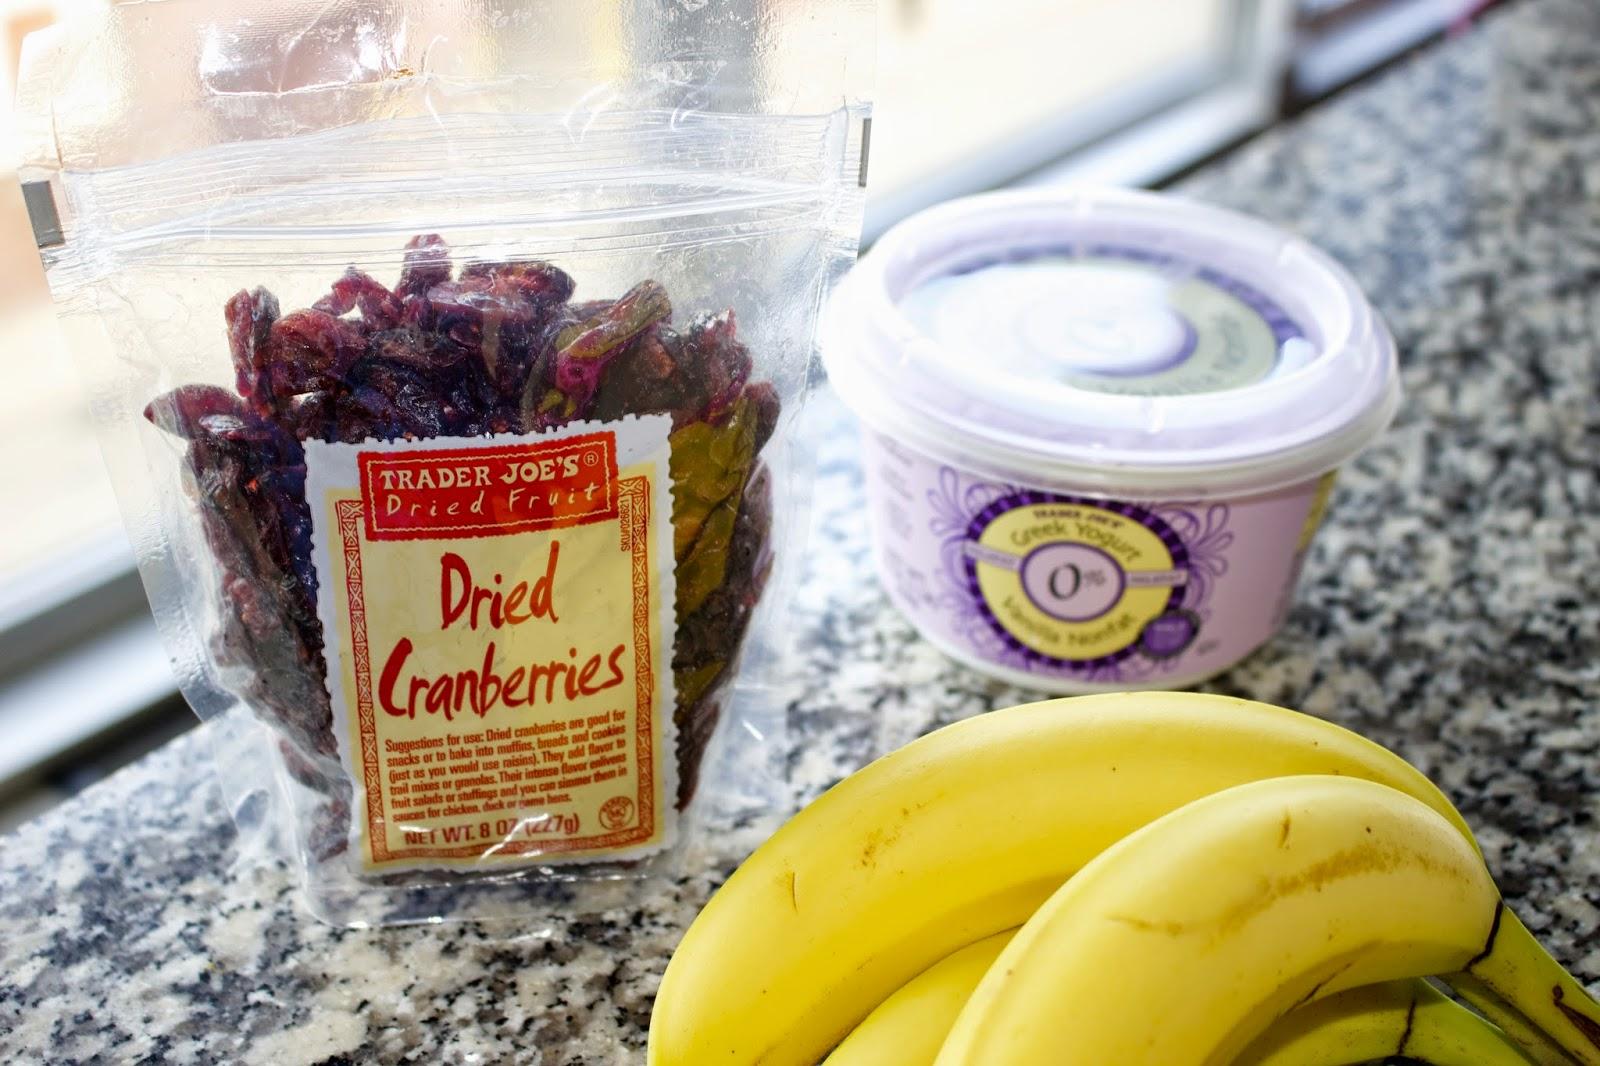 health, recipes, frozen greek yogurt bananas, easy recipes, easy healthy banana recipe, trader joes healthy recipes,